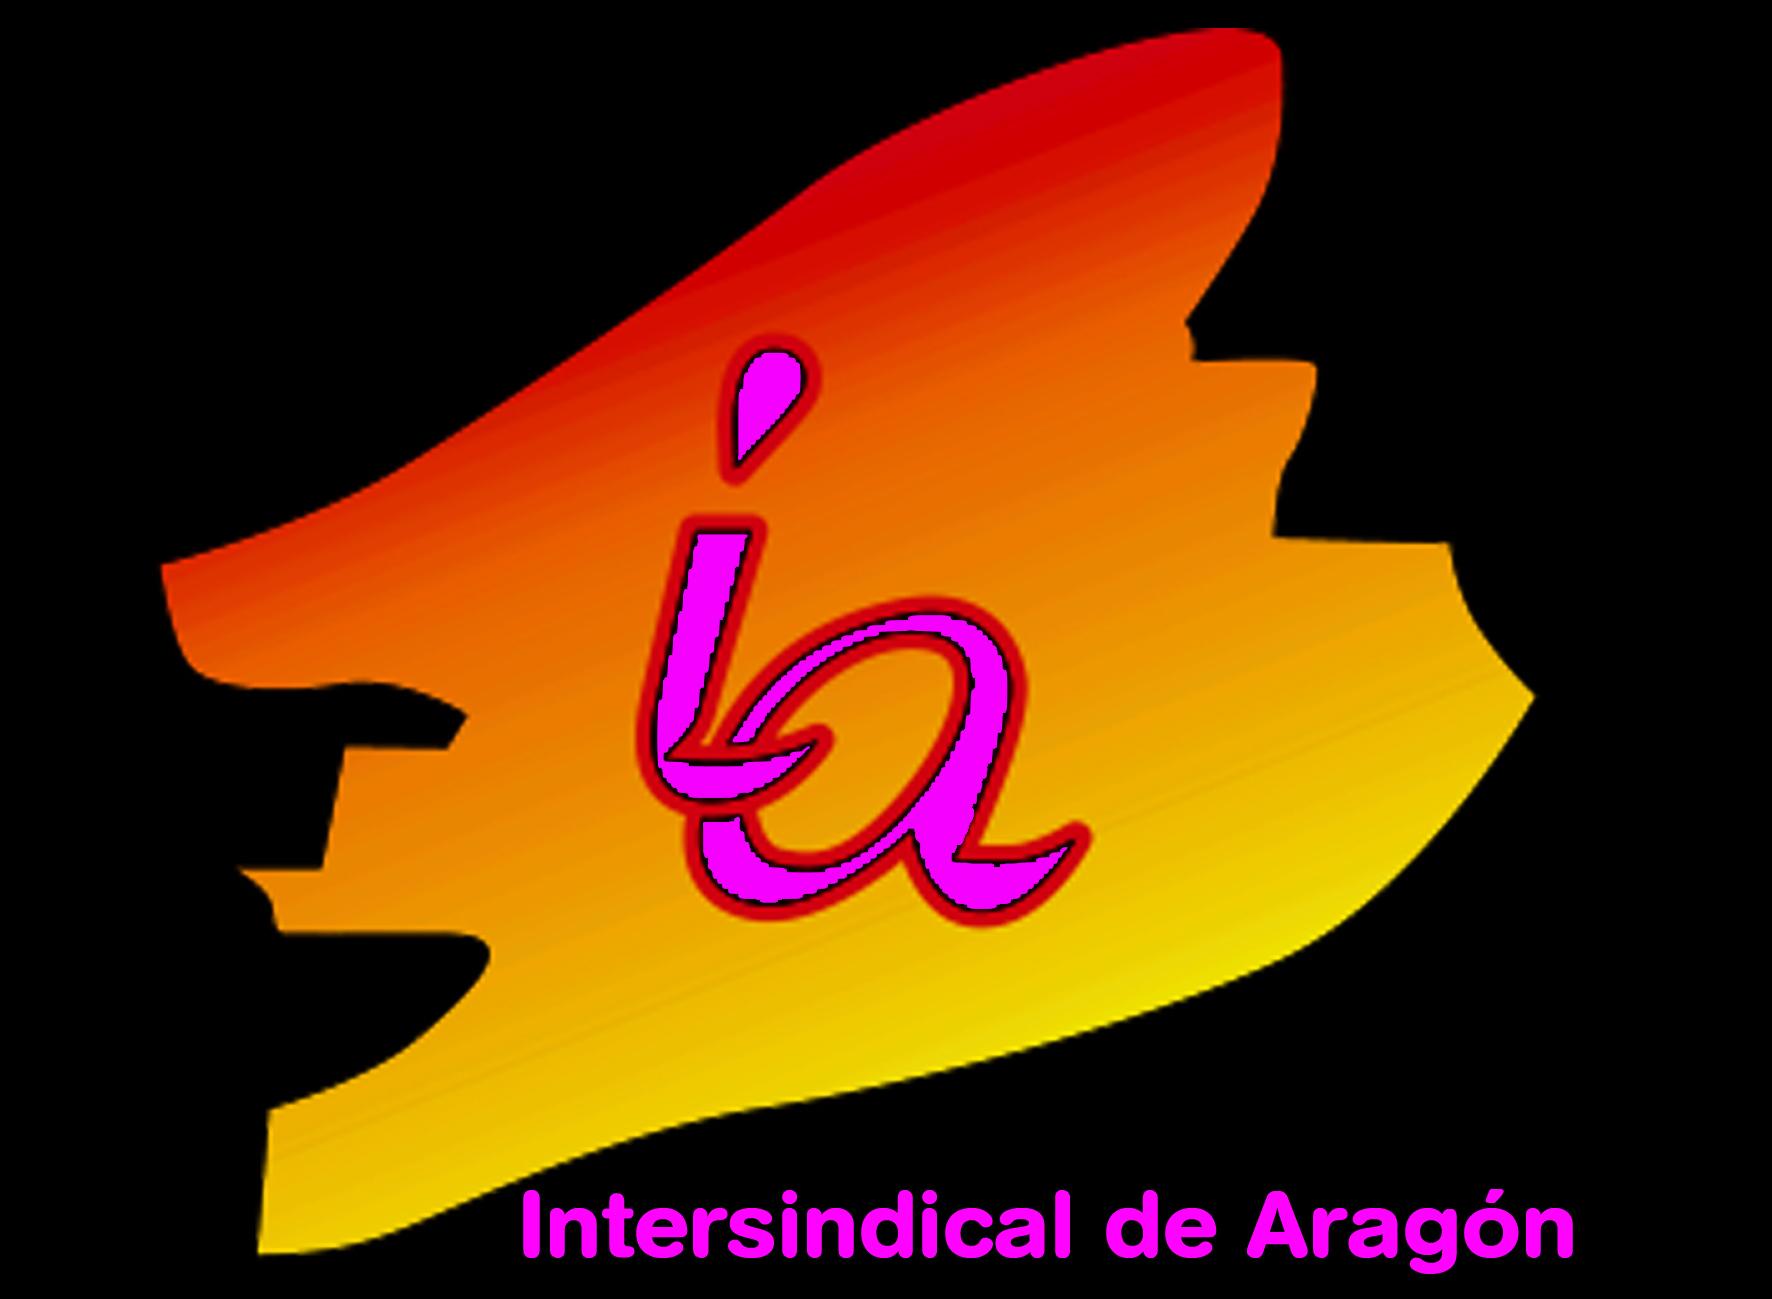 CONGRESO 1º INTERSINDICAL ARAGON, IA. SABADO 28 DE SEPTIEMBRE 2019.